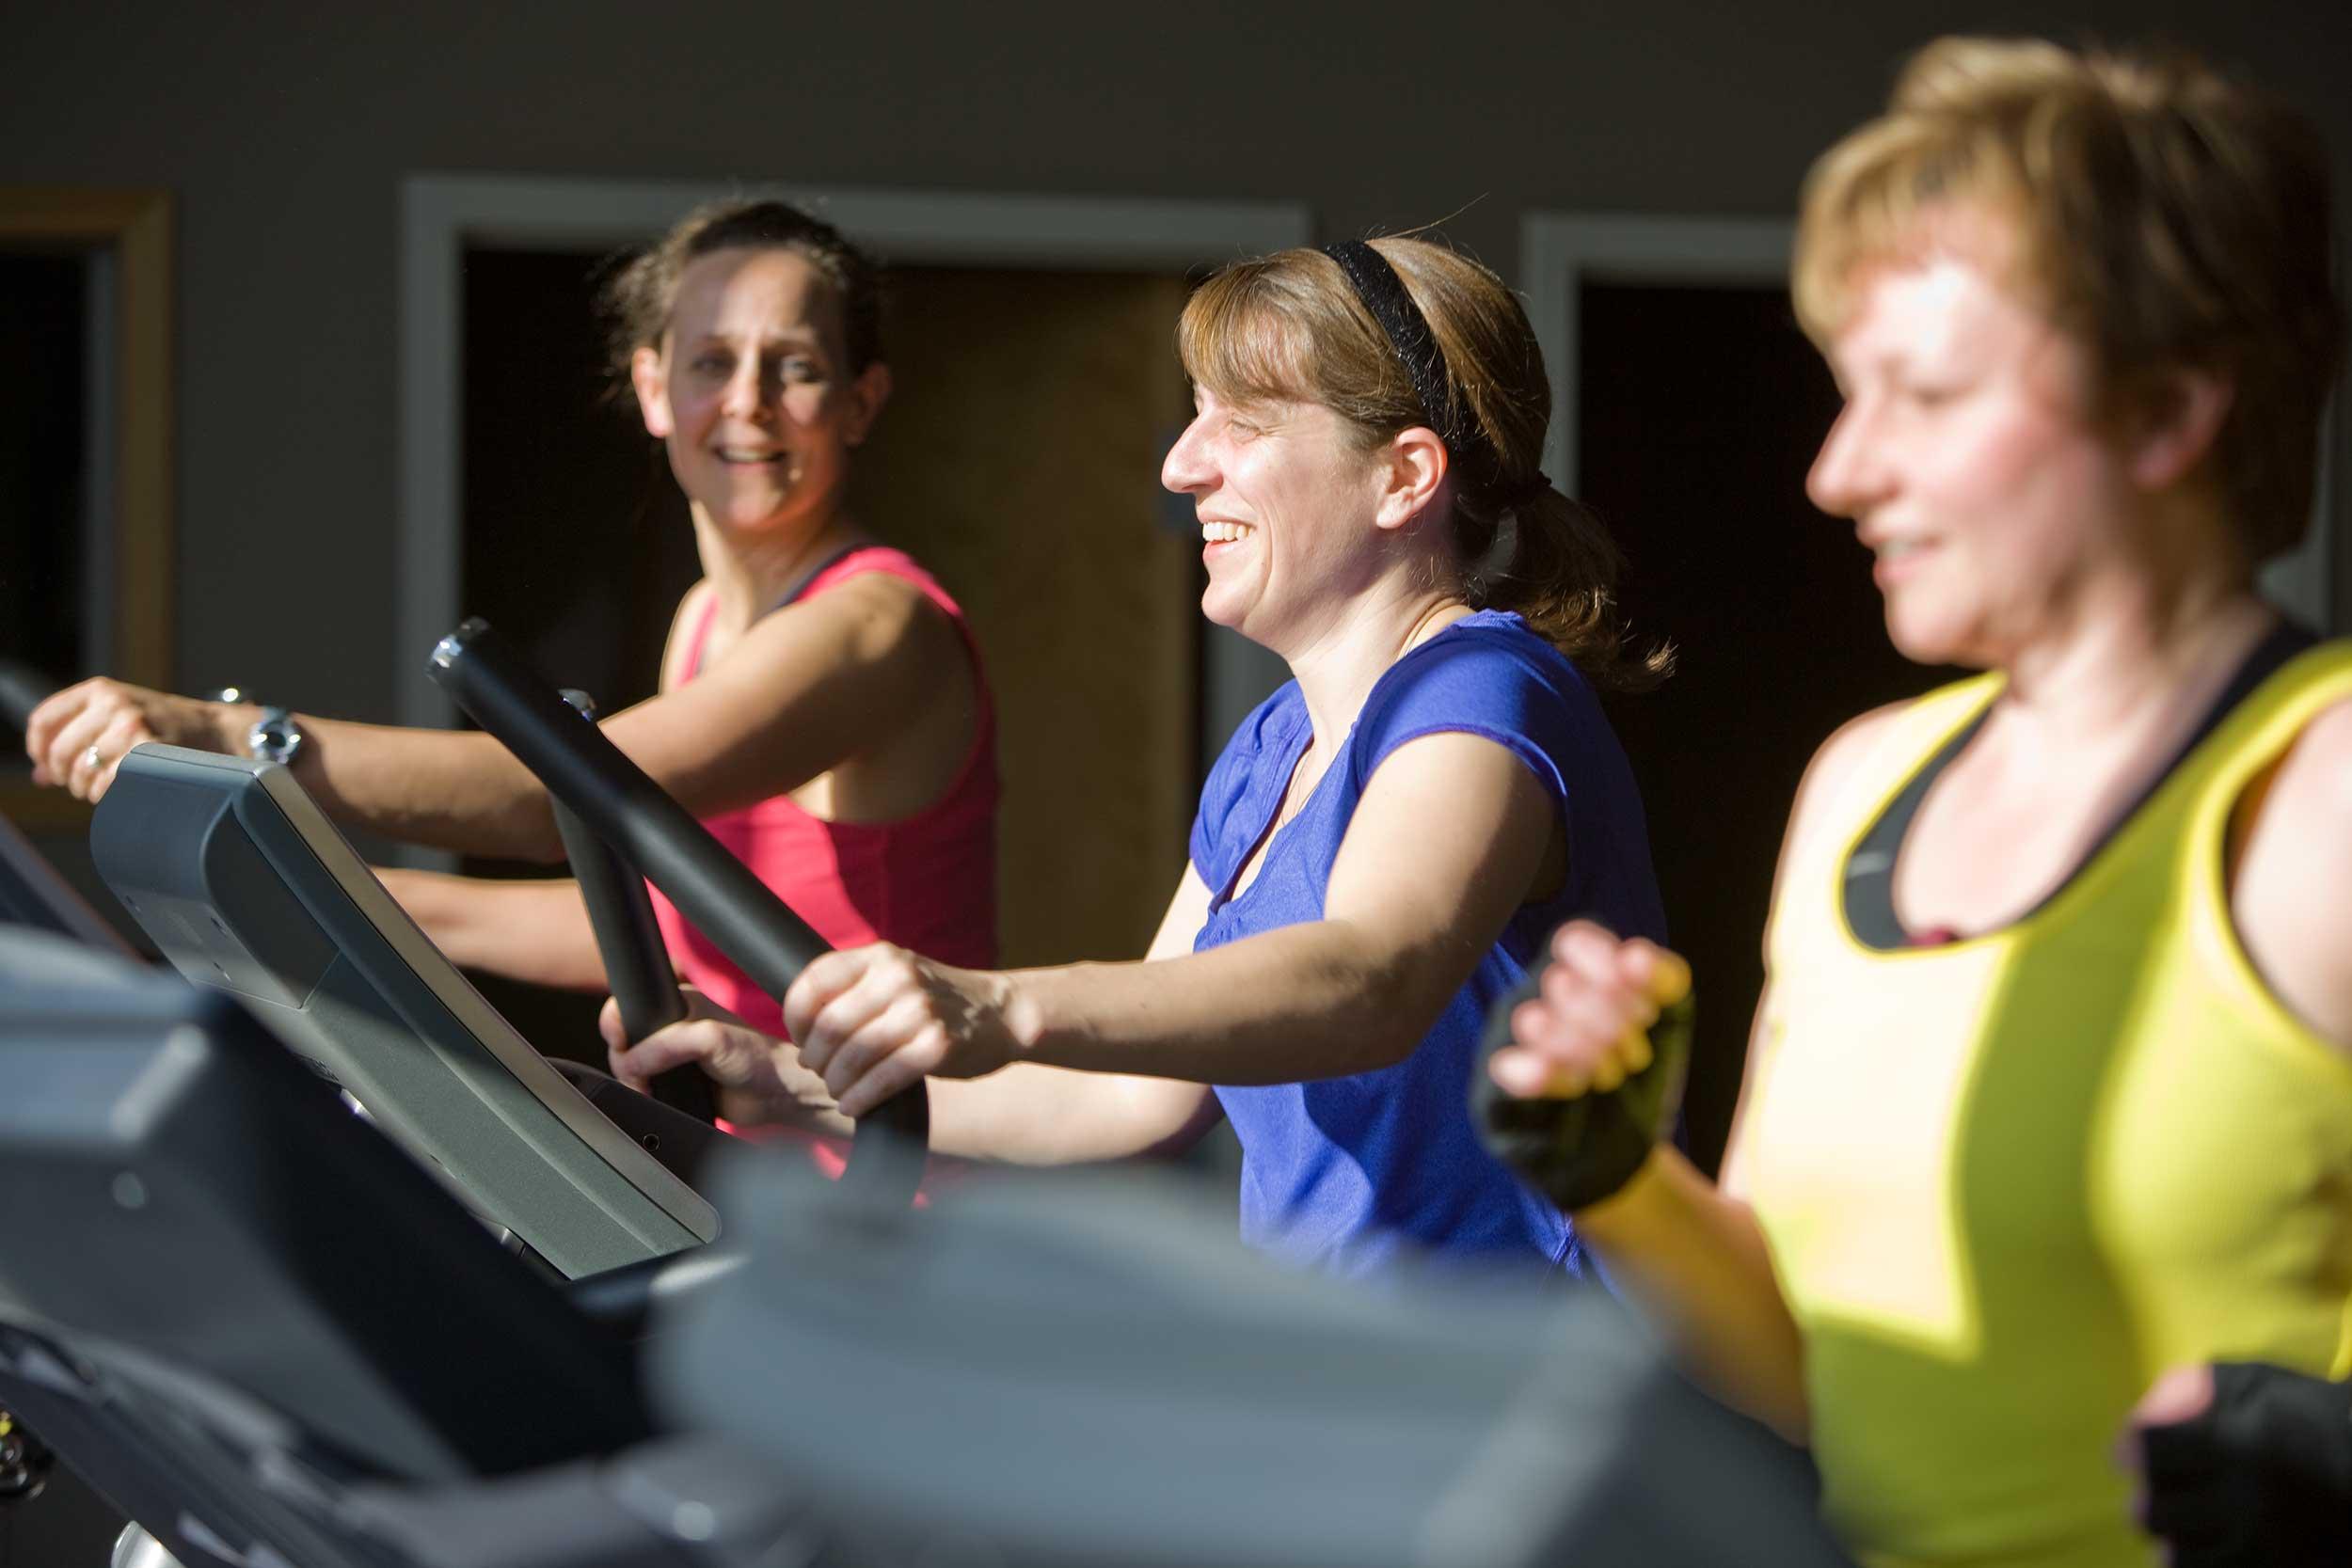 Happy-cardio-women.jpg